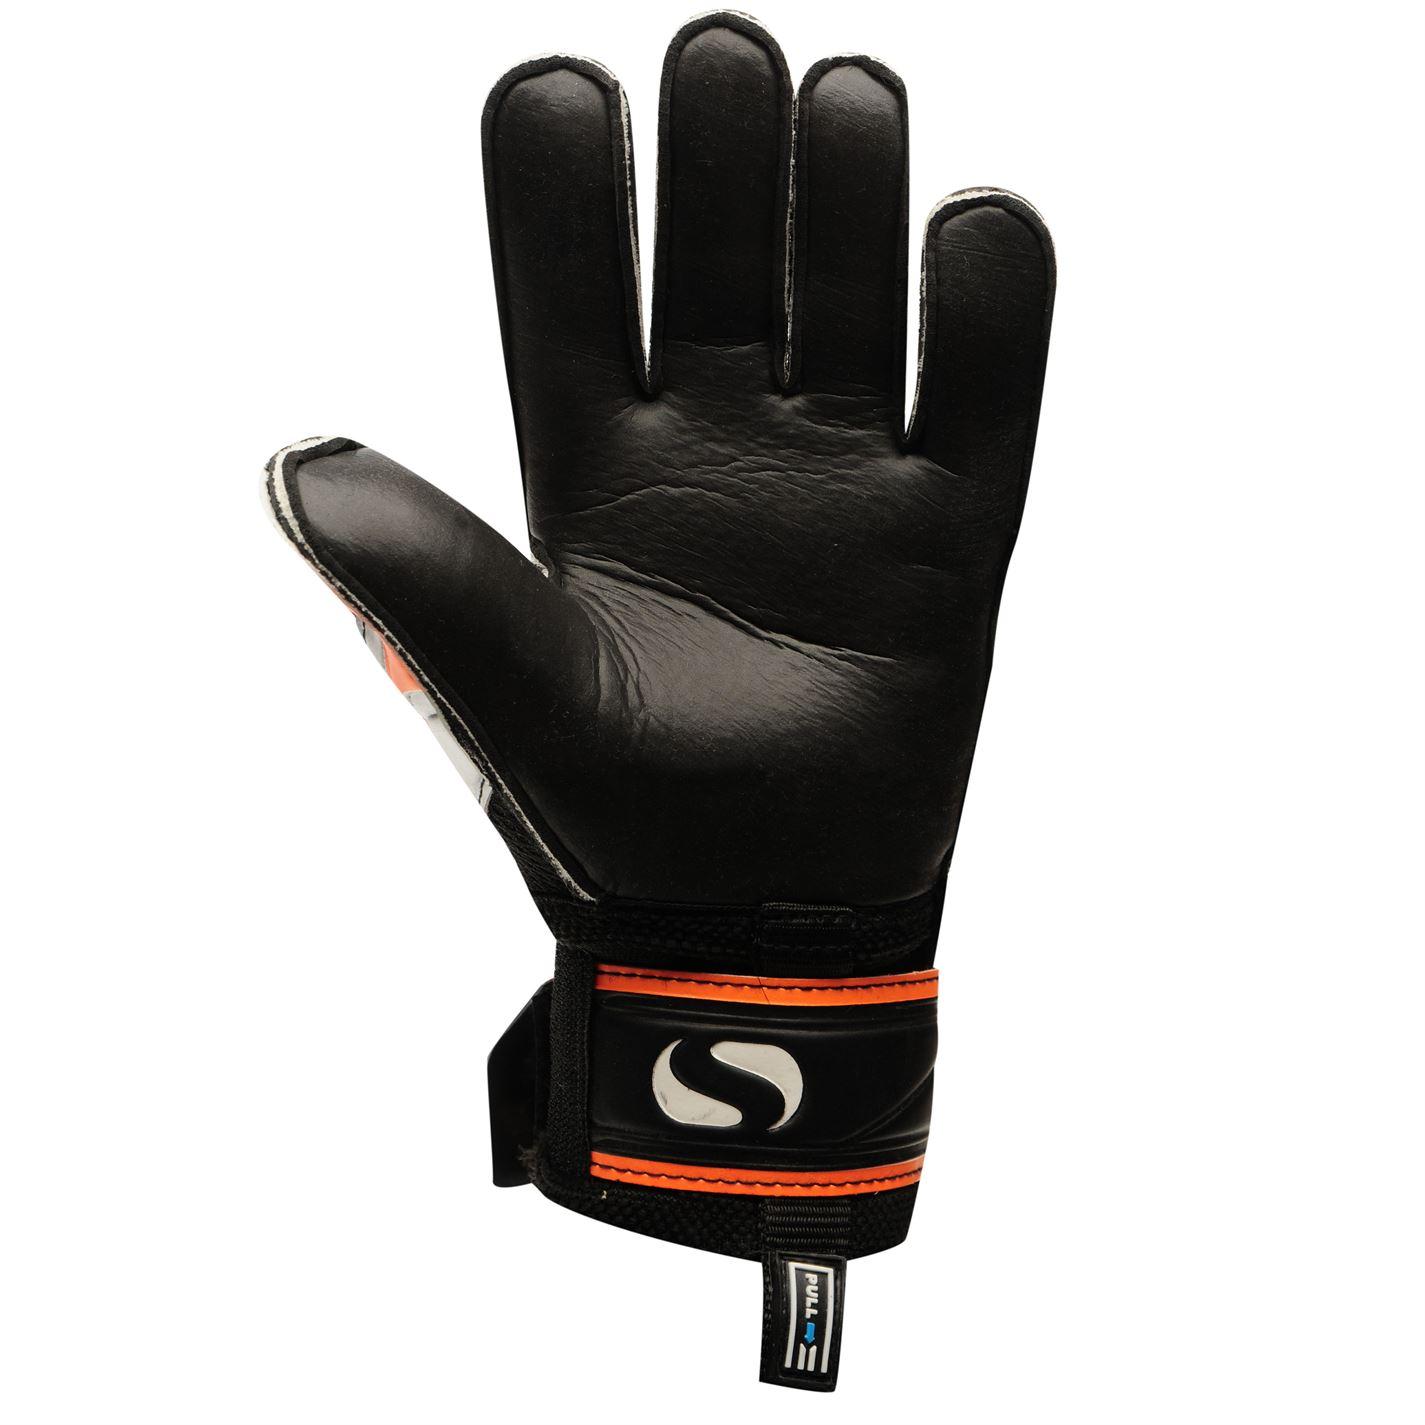 Sondico Mens EliteProtect Goalkeeper Gloves Football Training Sports ... d83671f5670e